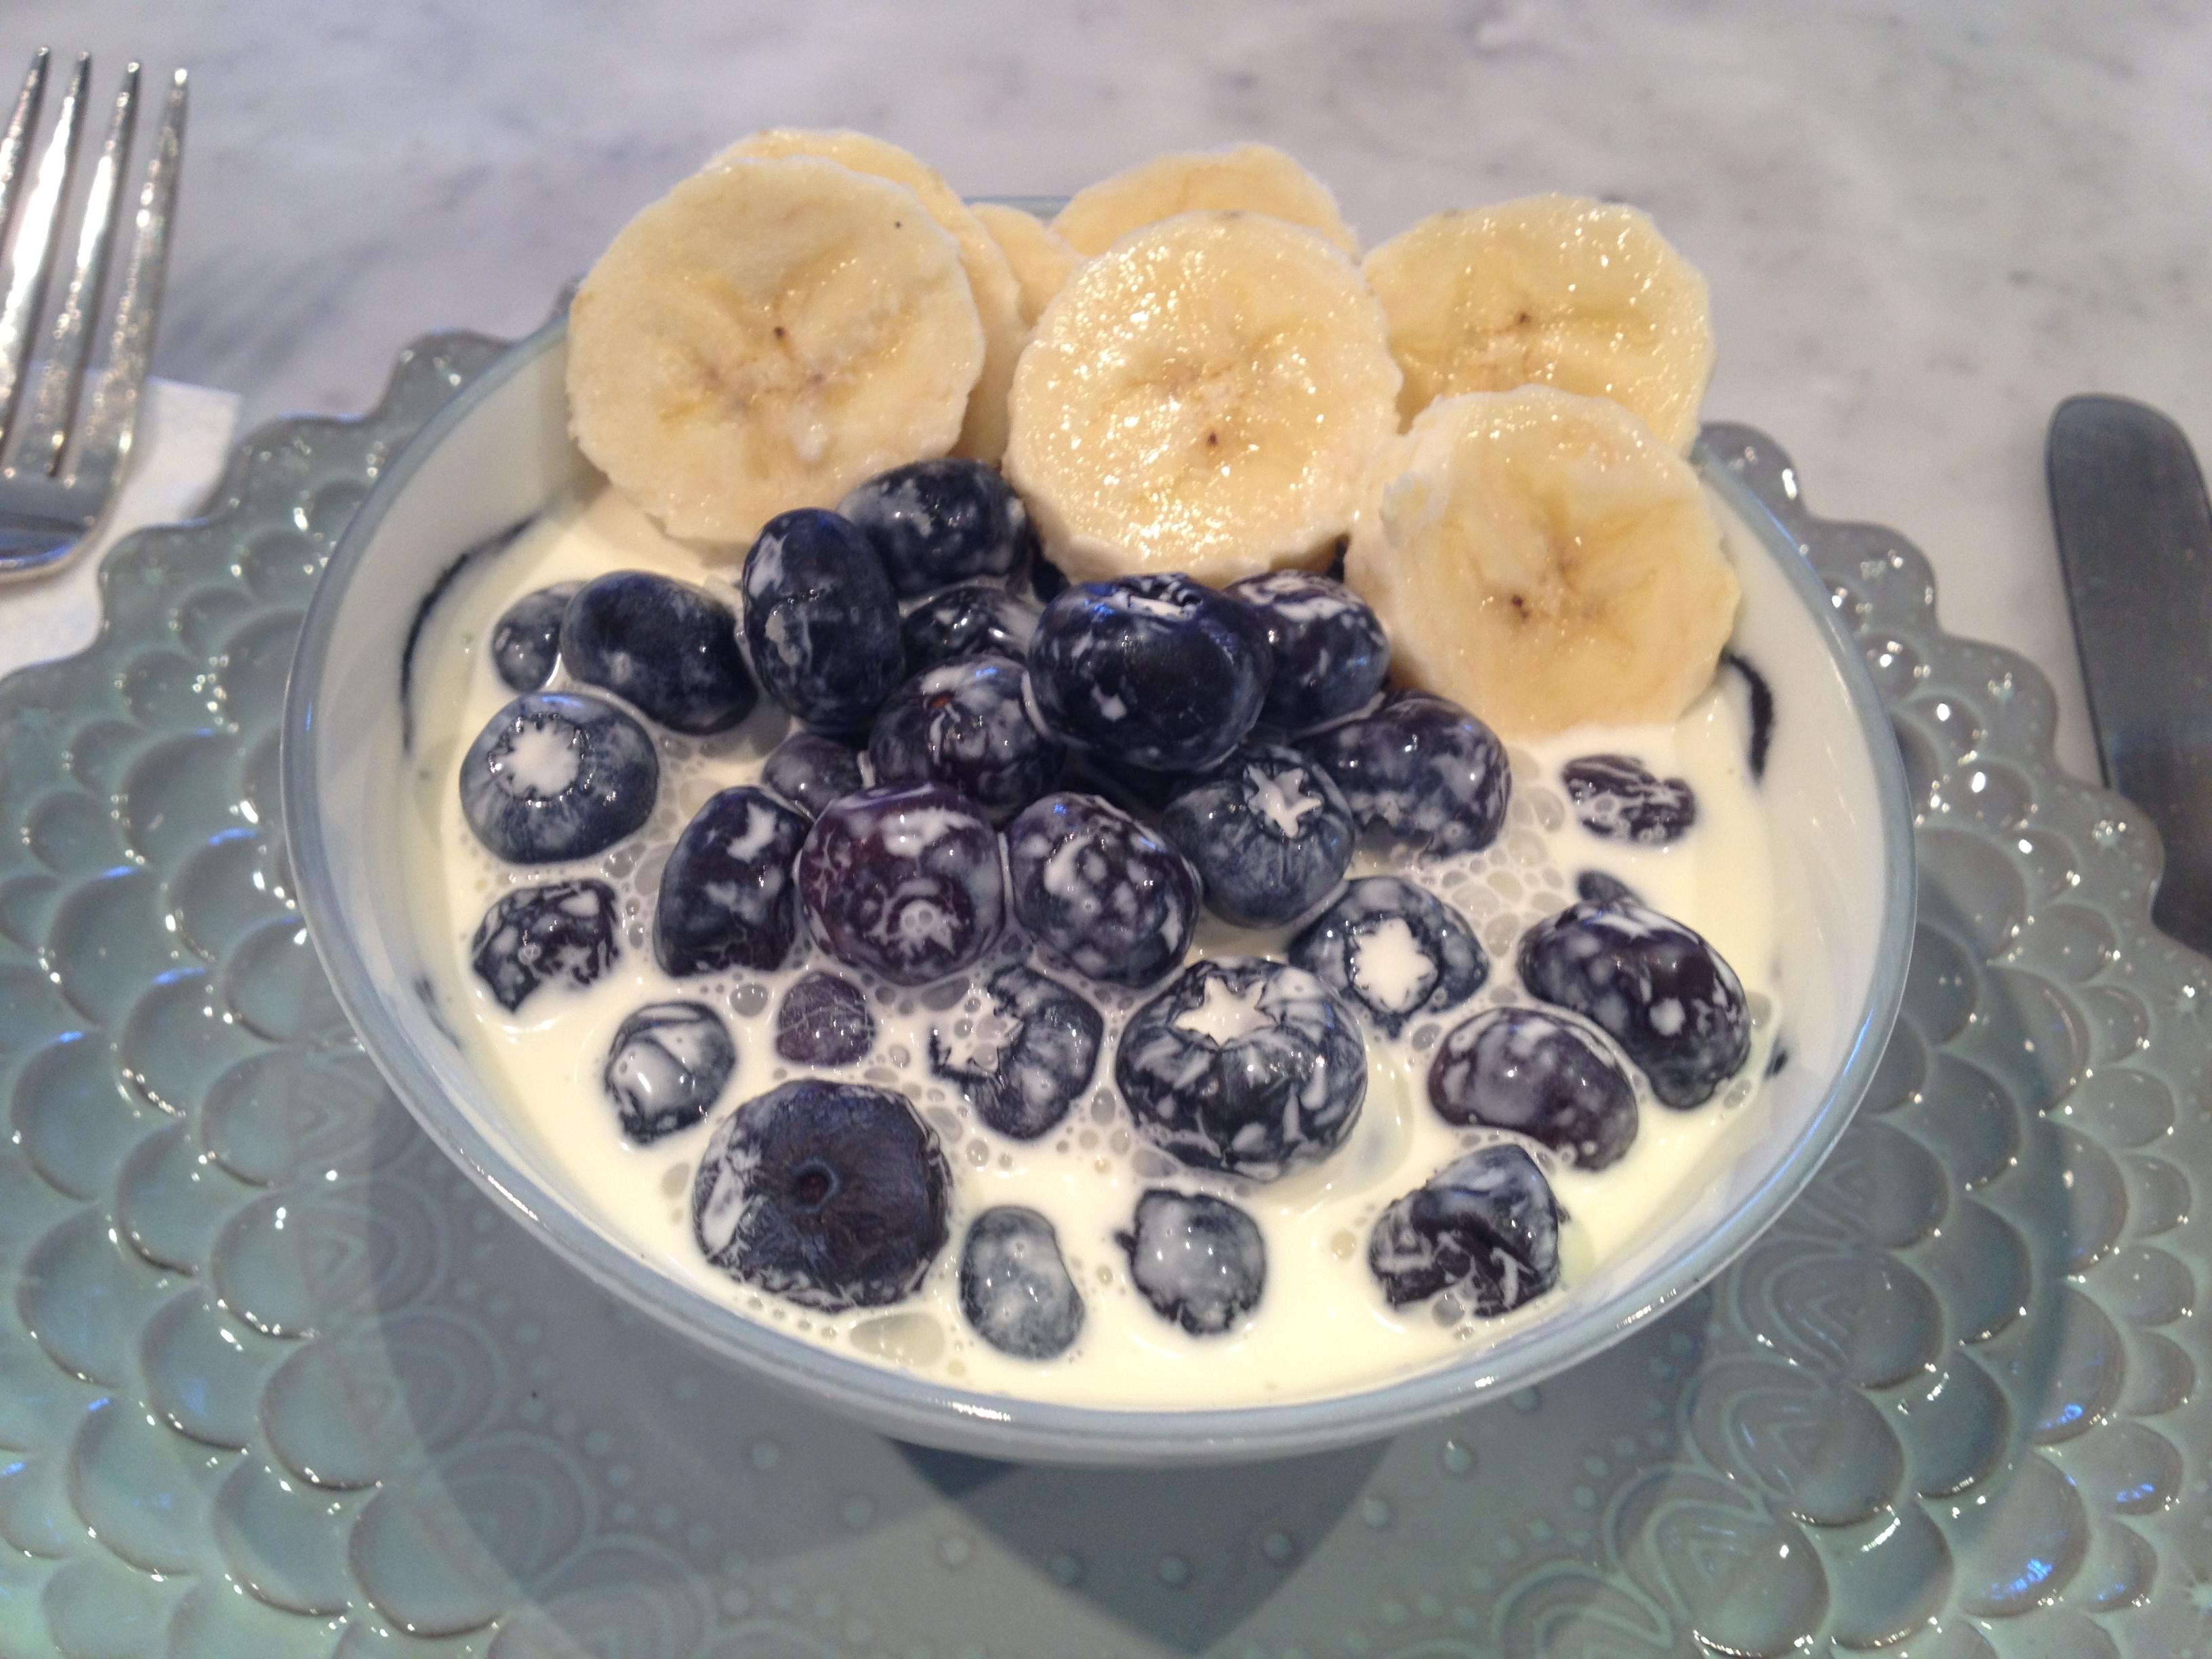 Mother's Breakfast Idea featured